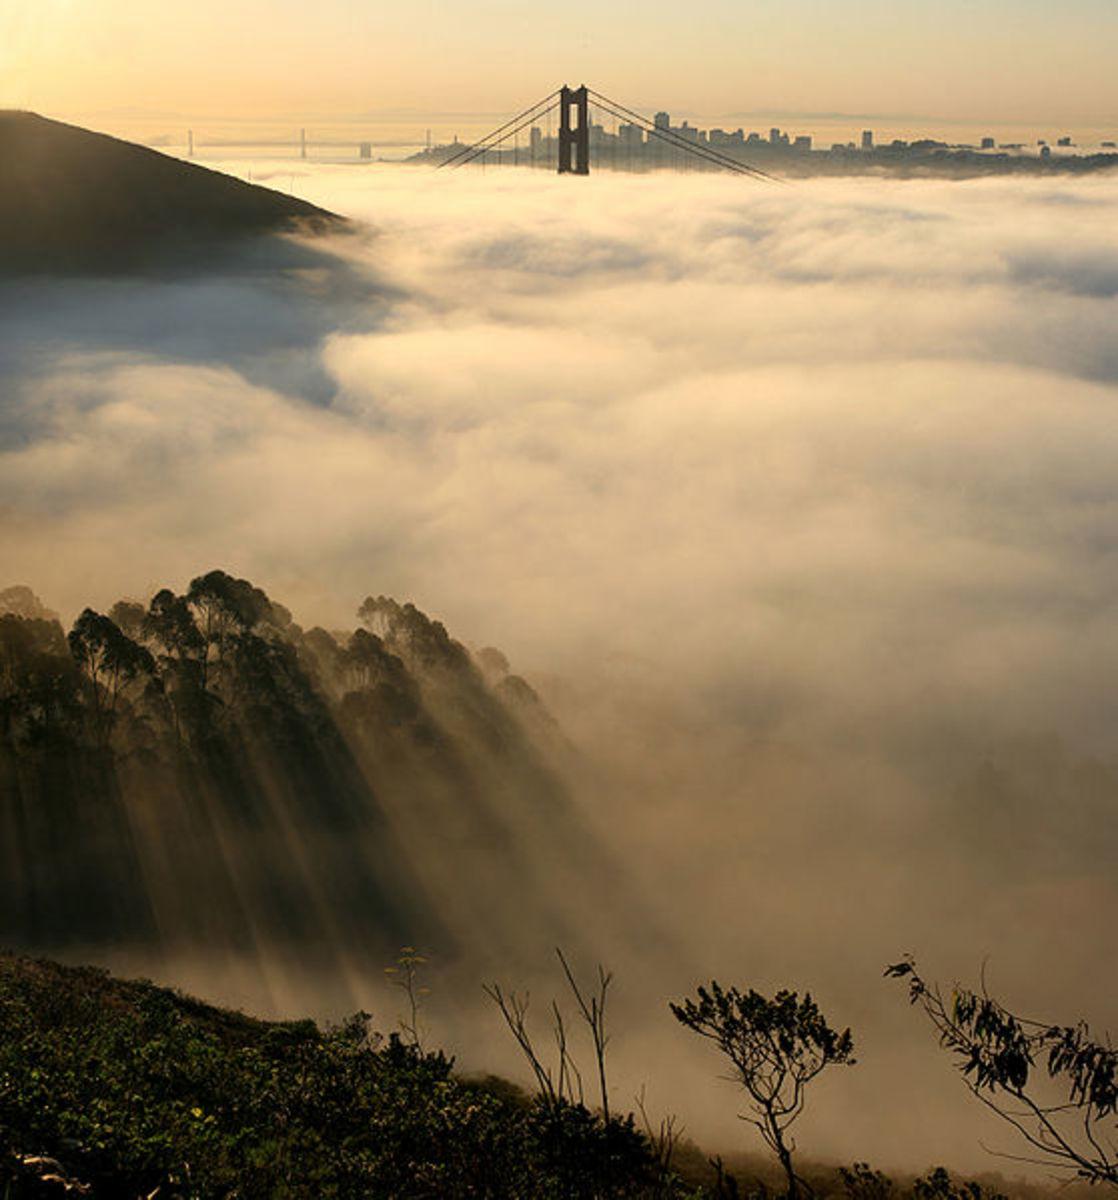 San Fran: Socked In Again